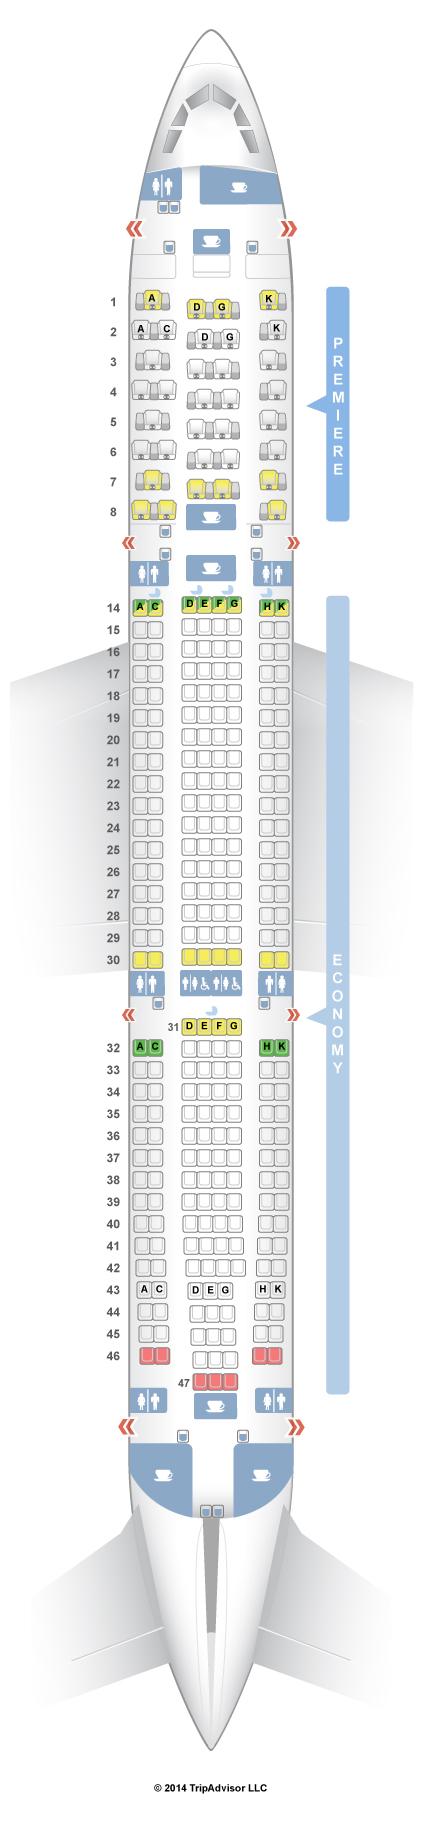 Seatguru Seat Map Jet Airways Airbus A330 300 333